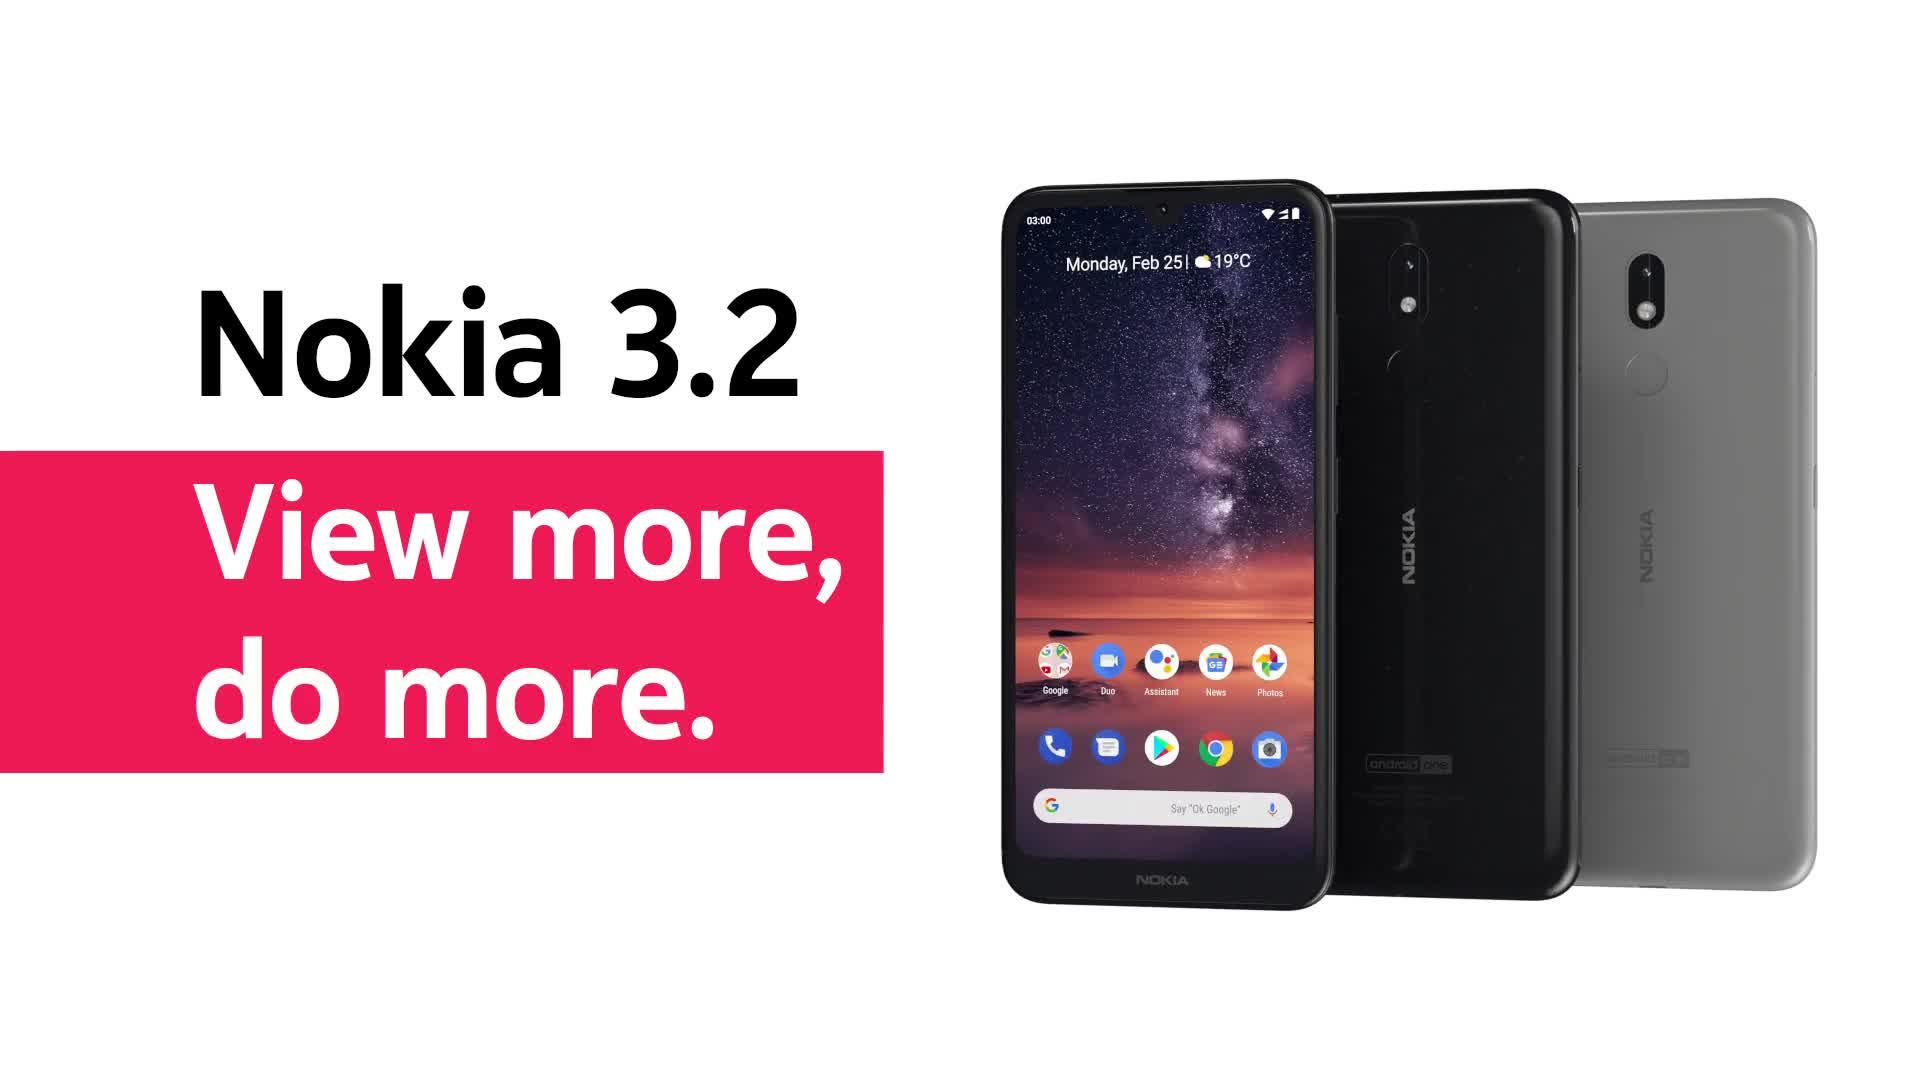 Smartphone, Nokia, Mwc, Mobile World Congress, MWC 2019, Mobile World Congress 2019, Nokia 3.2